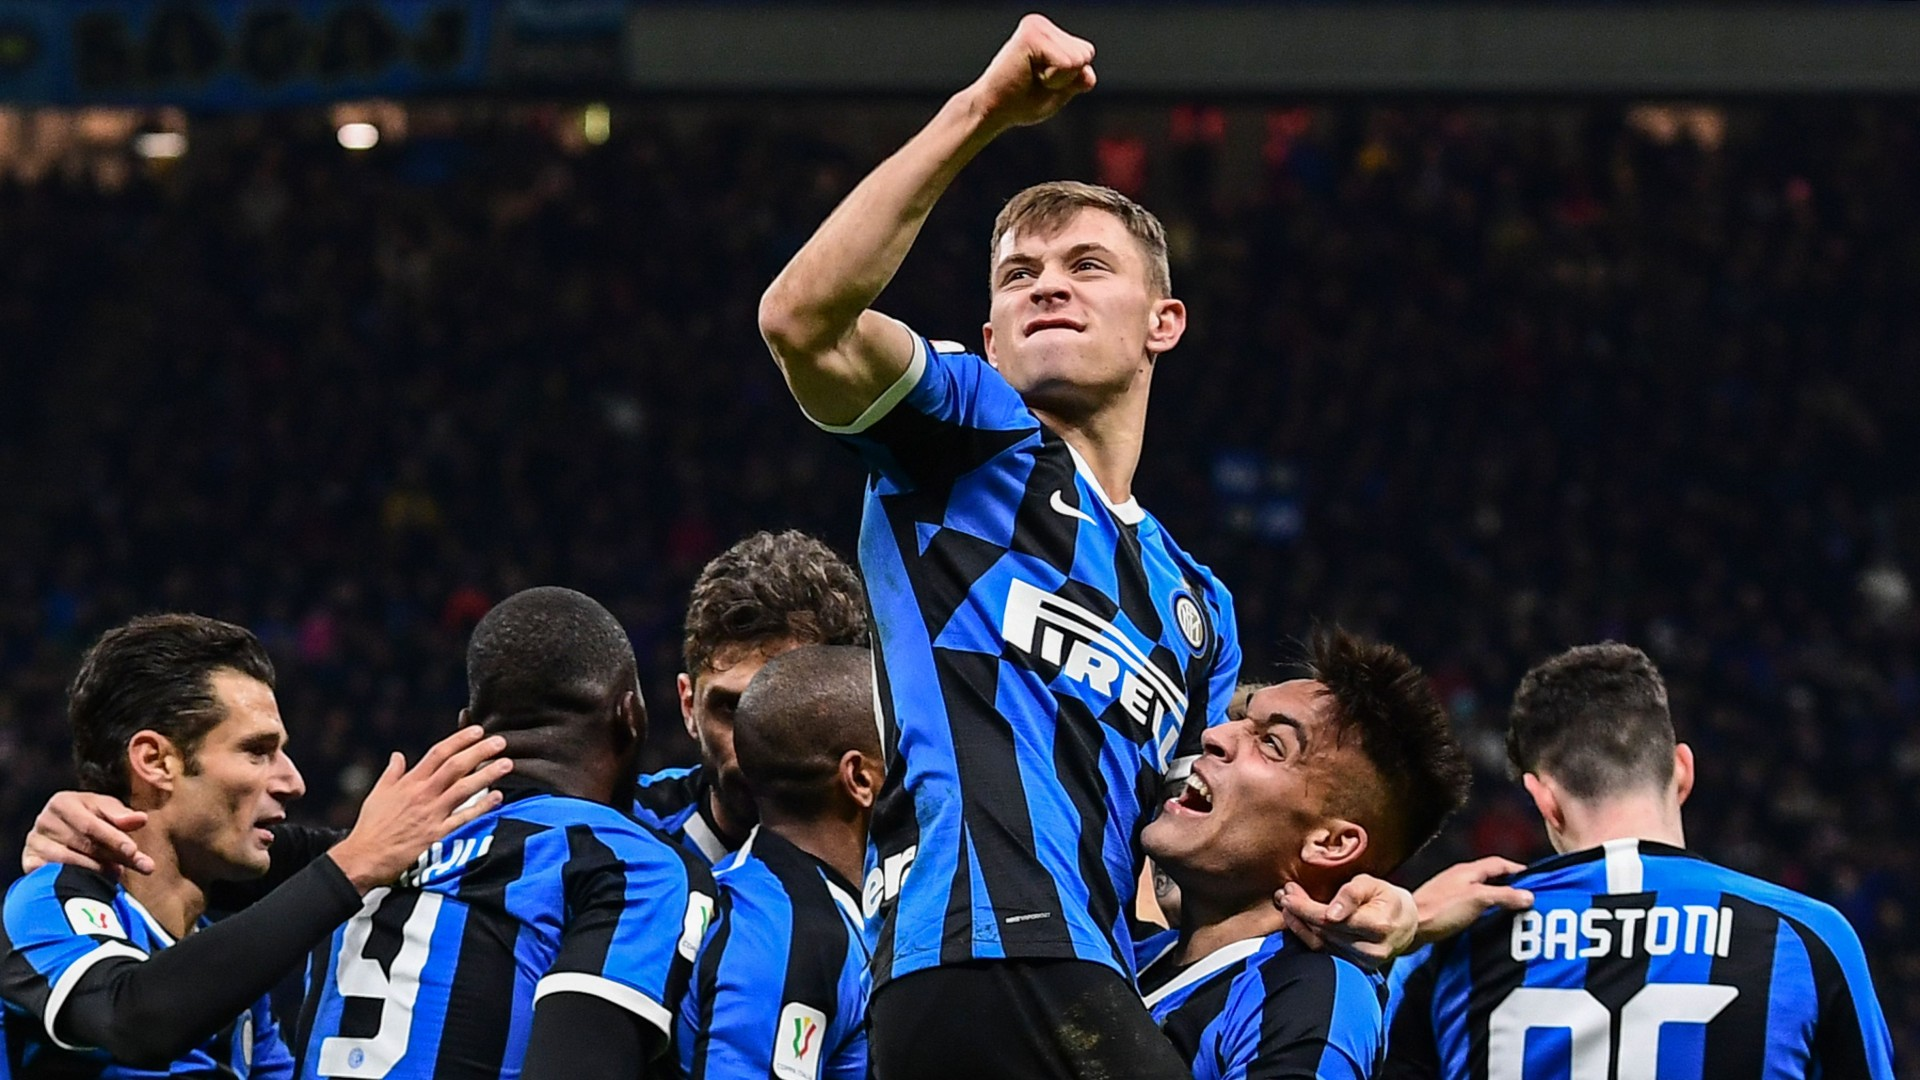 VIDEO Inter Milan vs Fiorentina (Serie A) Highlights